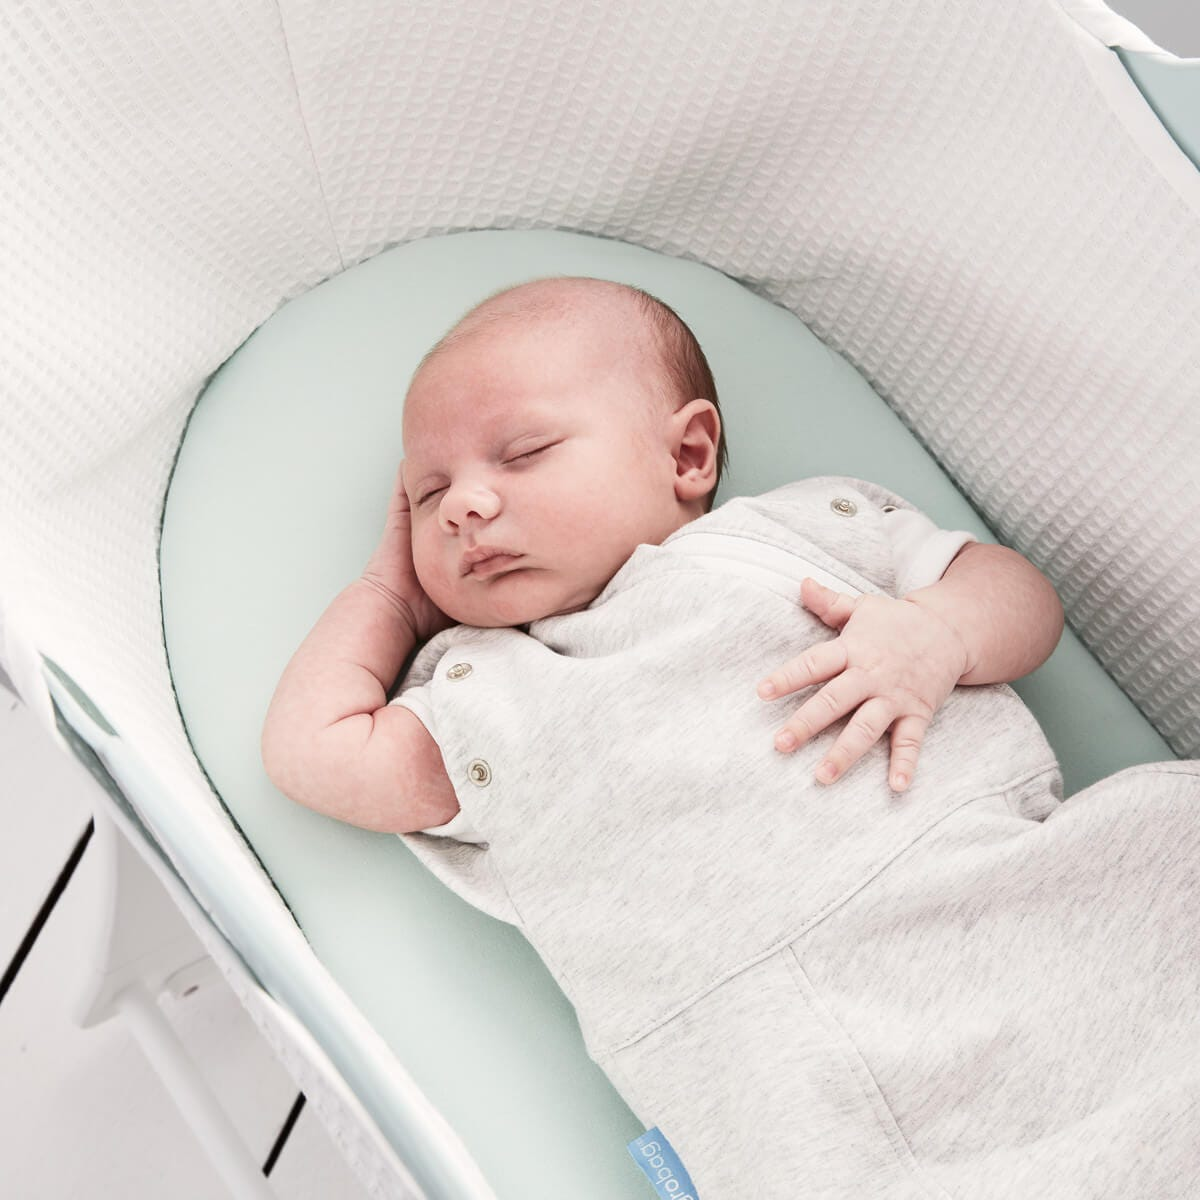 baby-asleep-in-sleepee-basket-wearing-grey-marl-grosnug